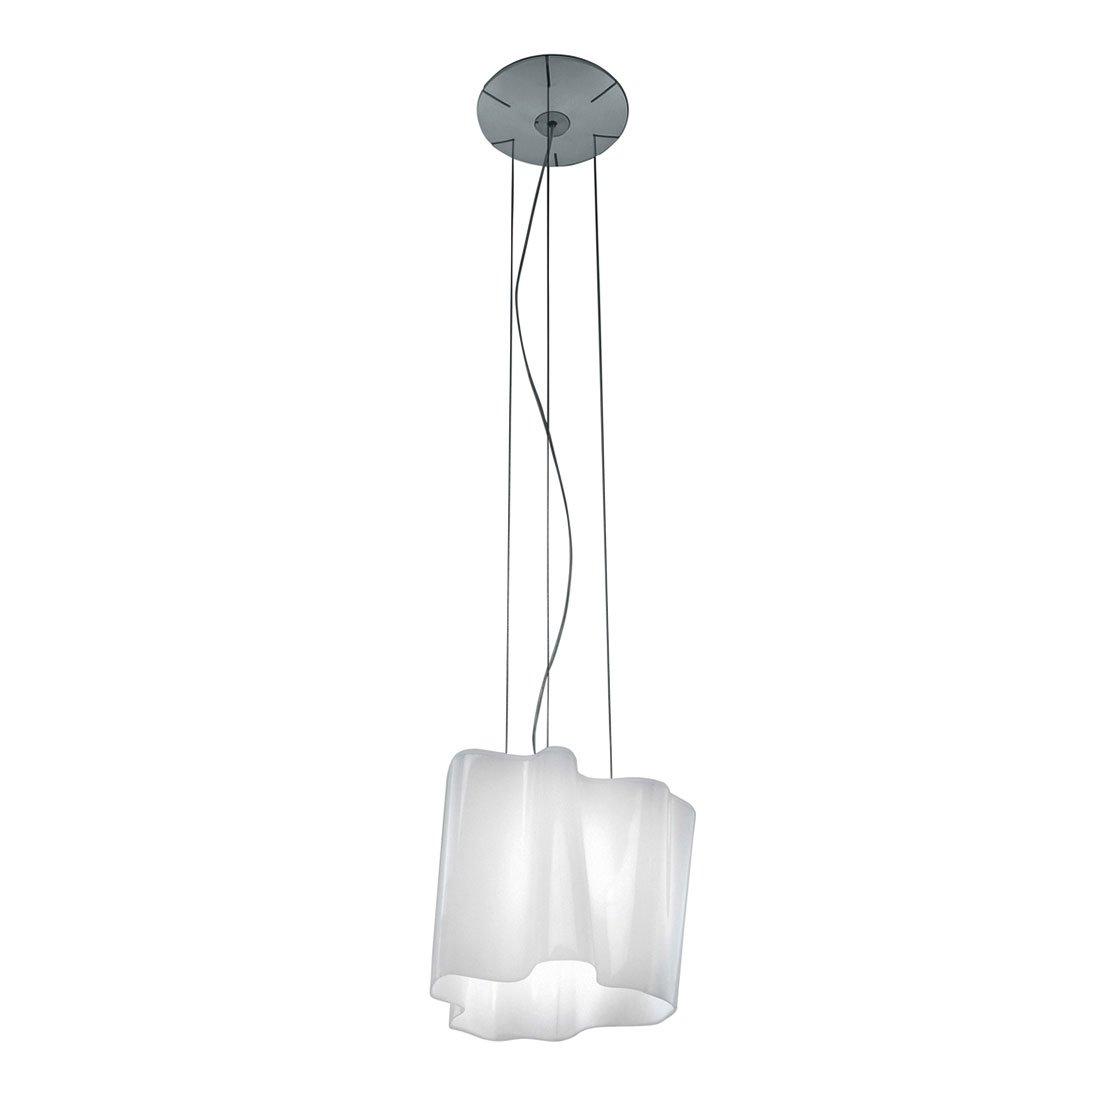 Logico Mini Single Hanglamp - Artemide